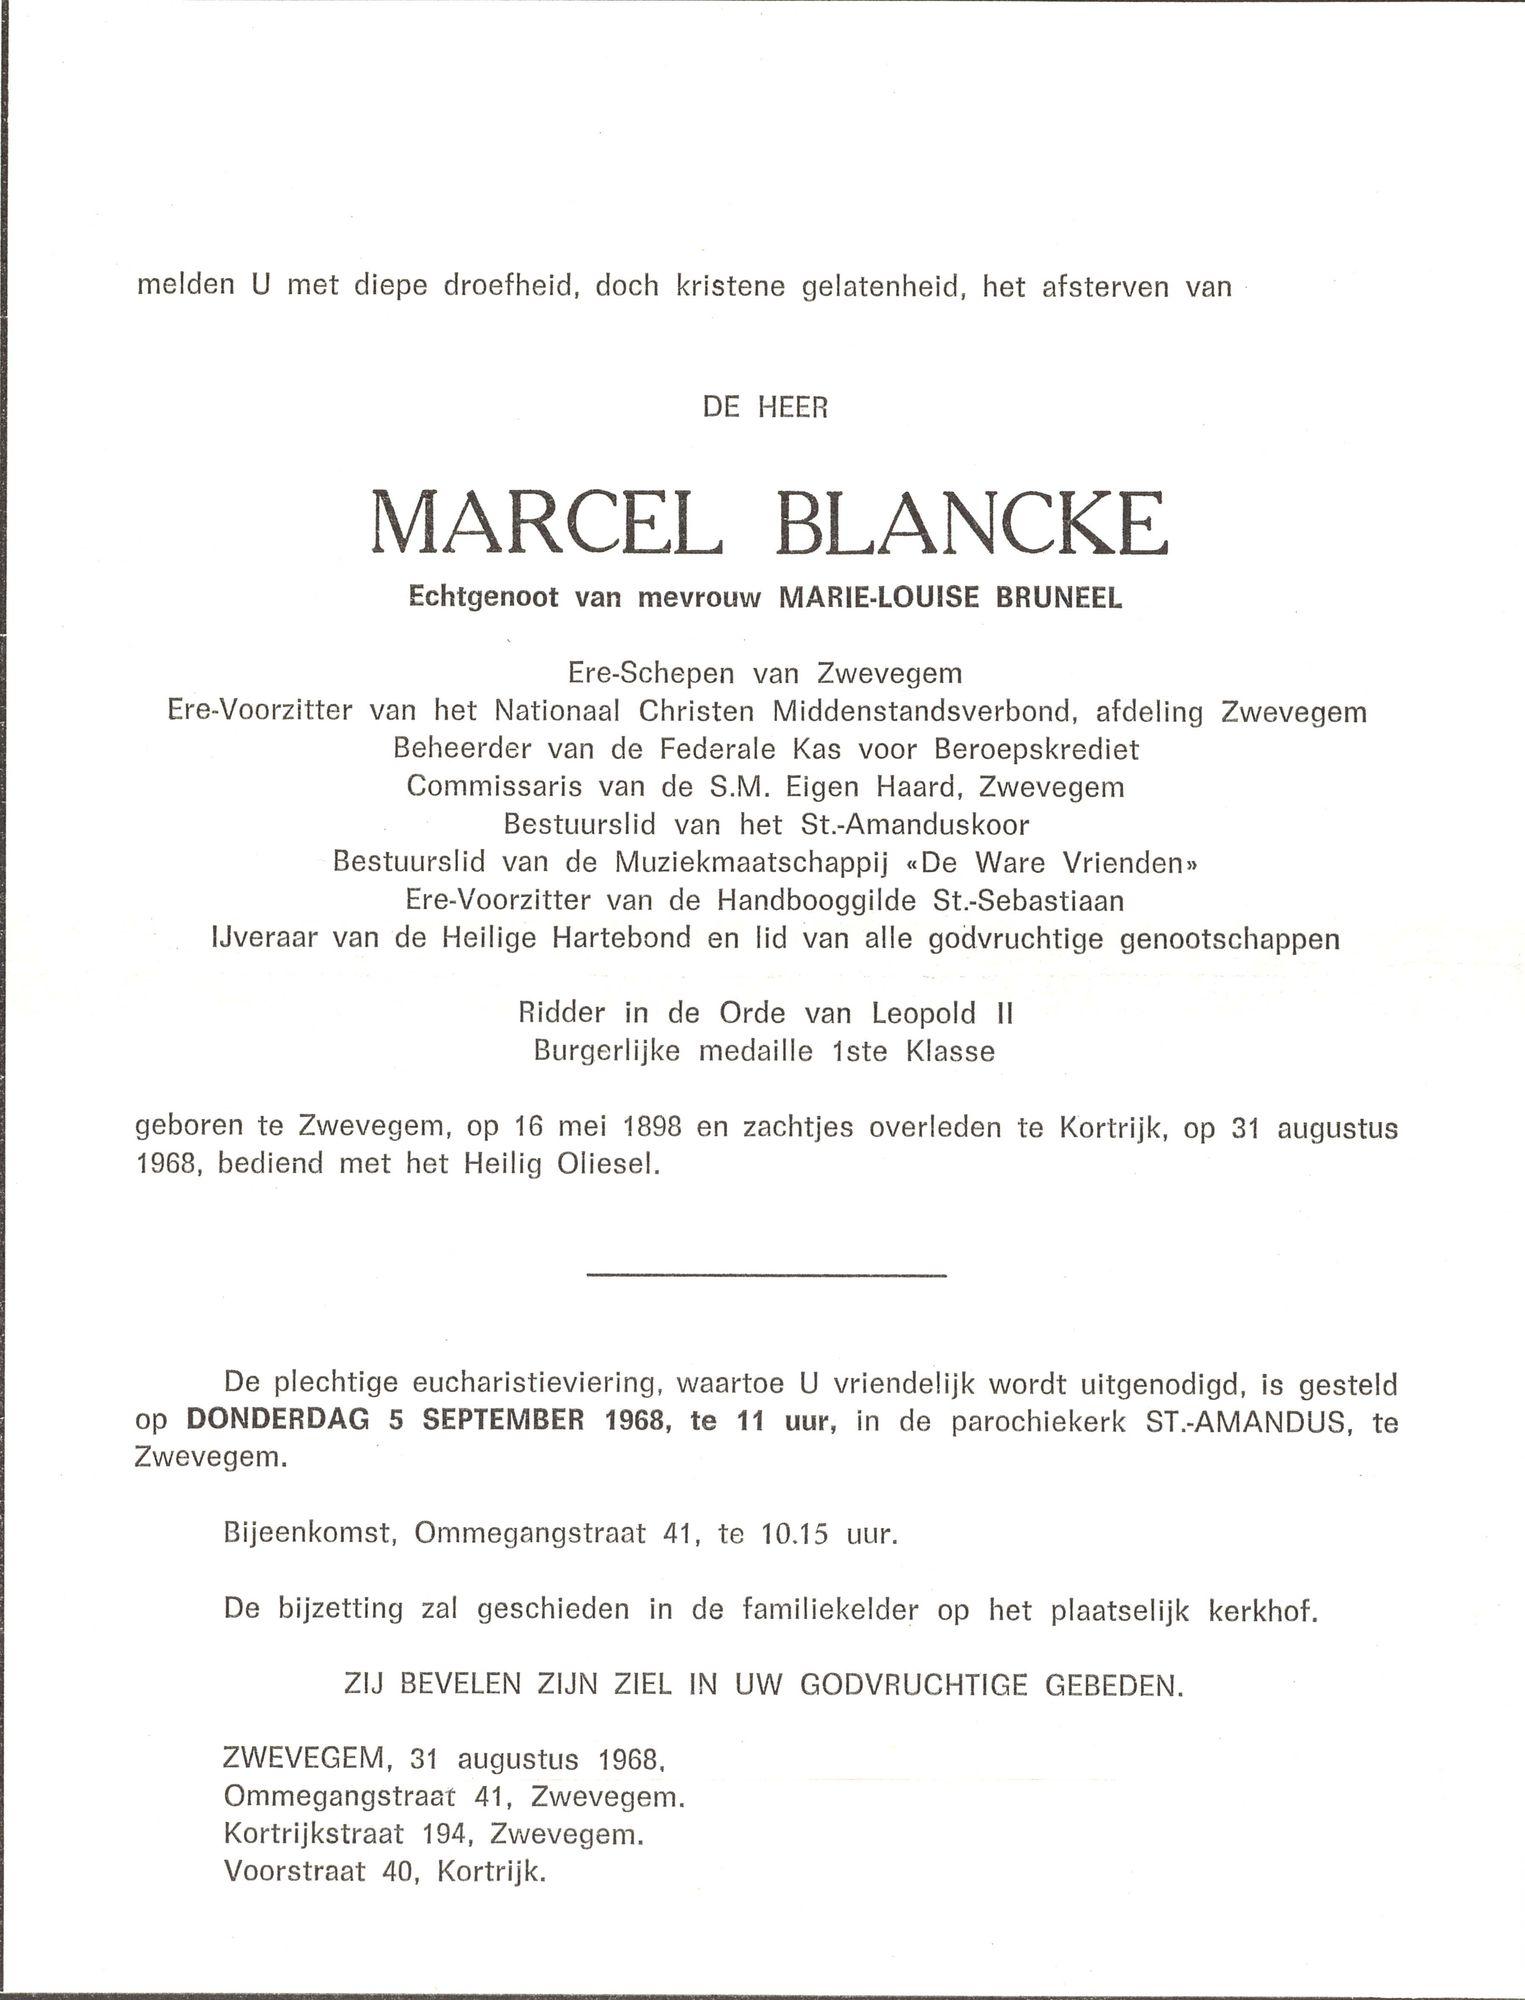 Marcel Blancke